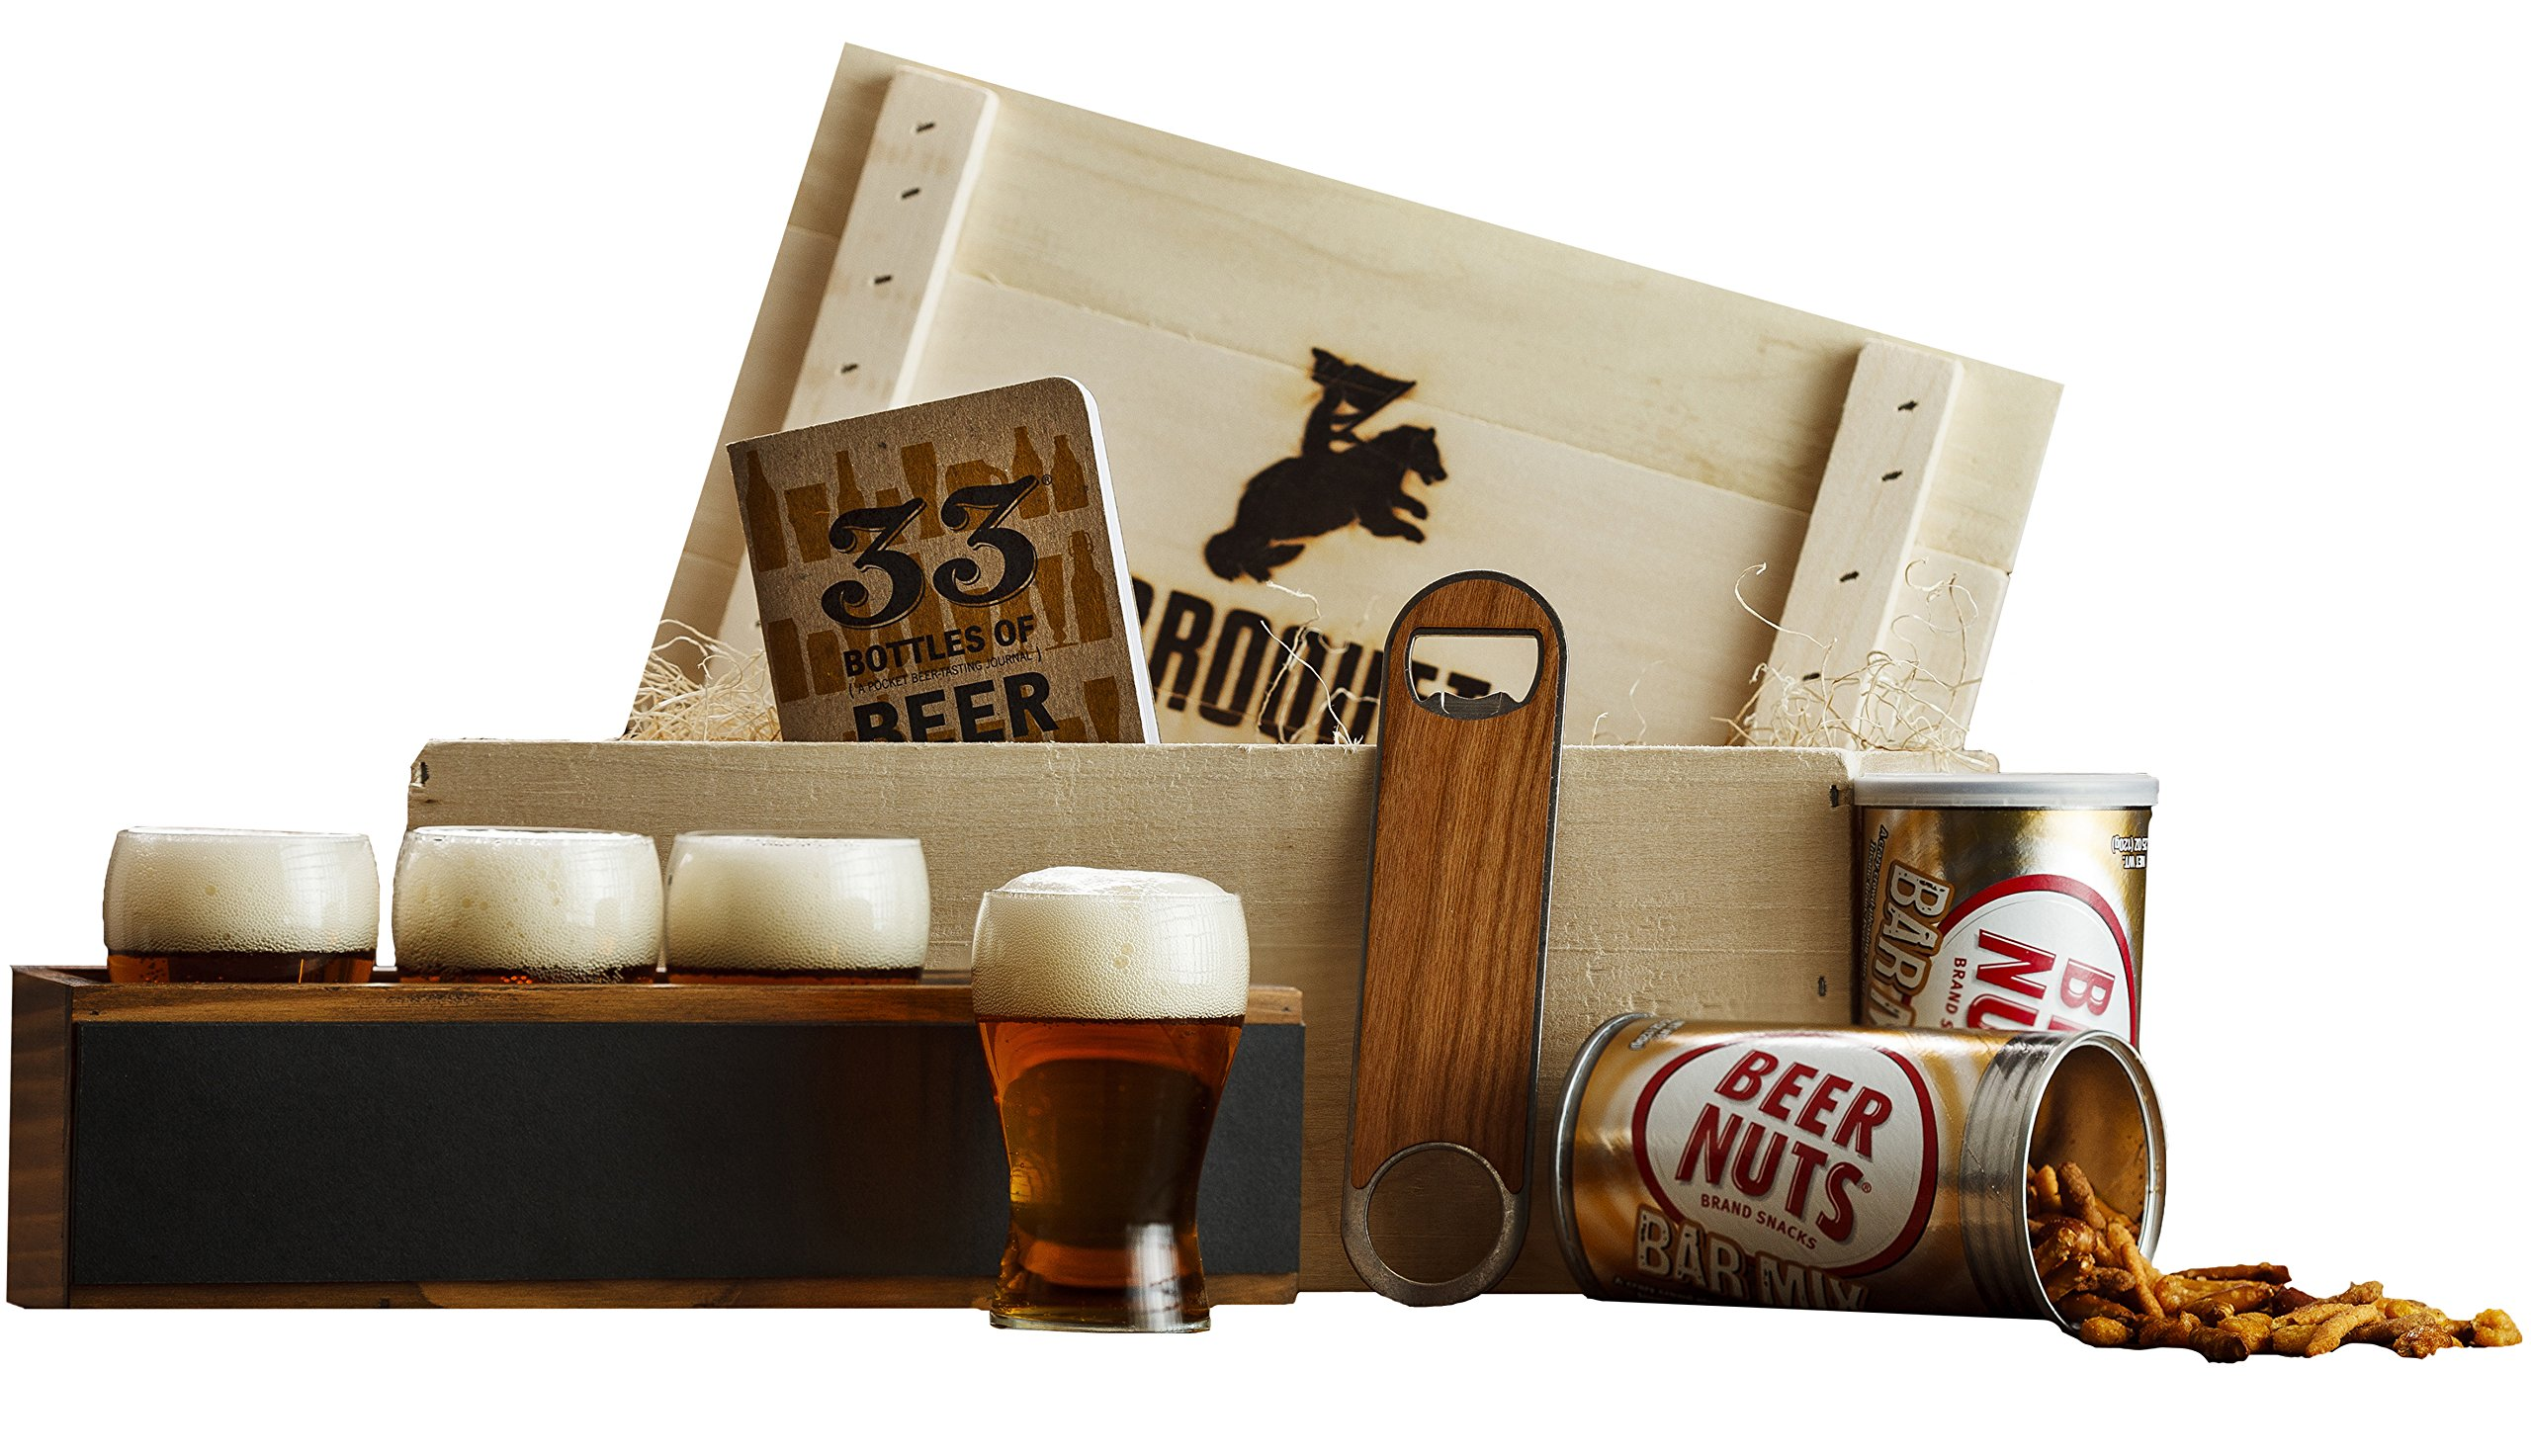 Ultimate Craft Beer Tasting Kit Gift - (9 Piece Drink Set) - Comes in a Wooden Gift Crate - Craft Beer Flight Sampler - Great Gift For Men